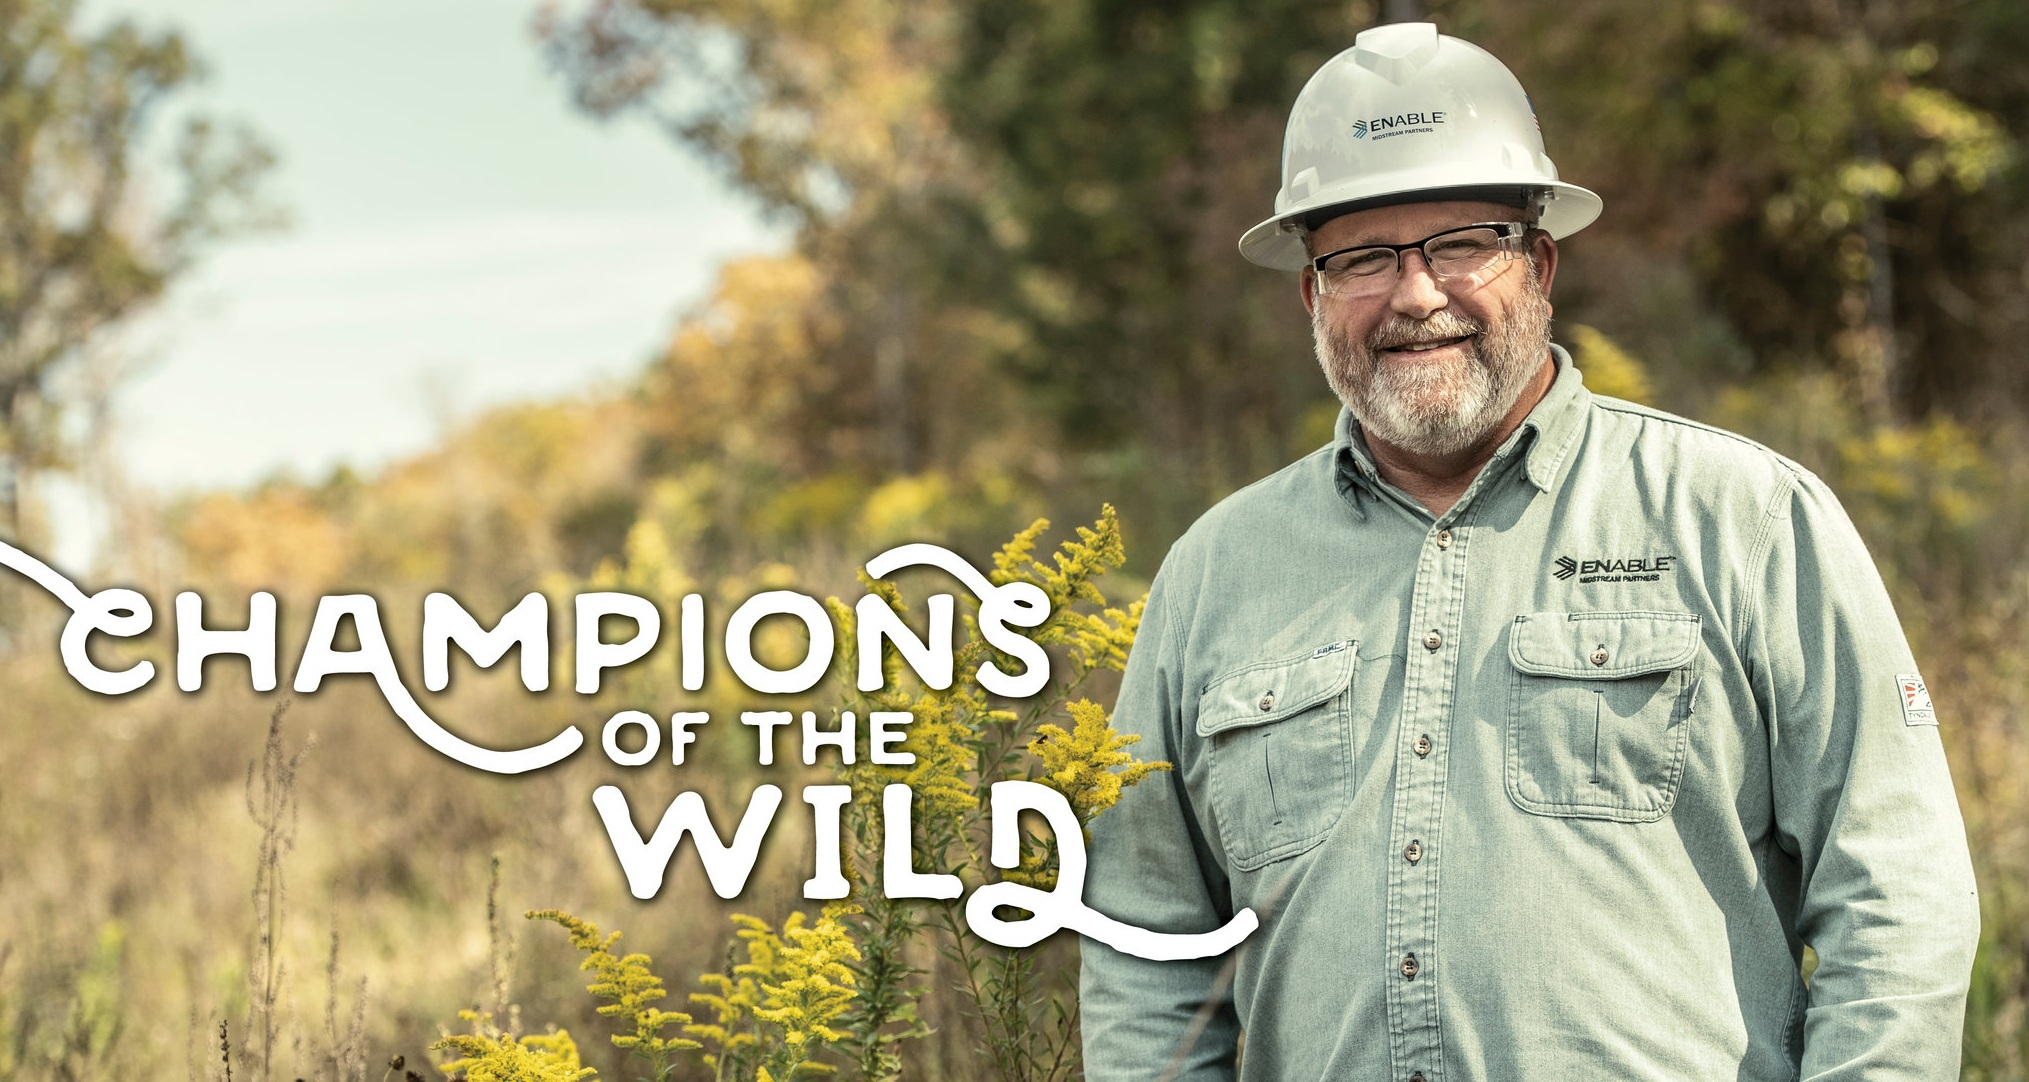 Champions of The wild.jpg